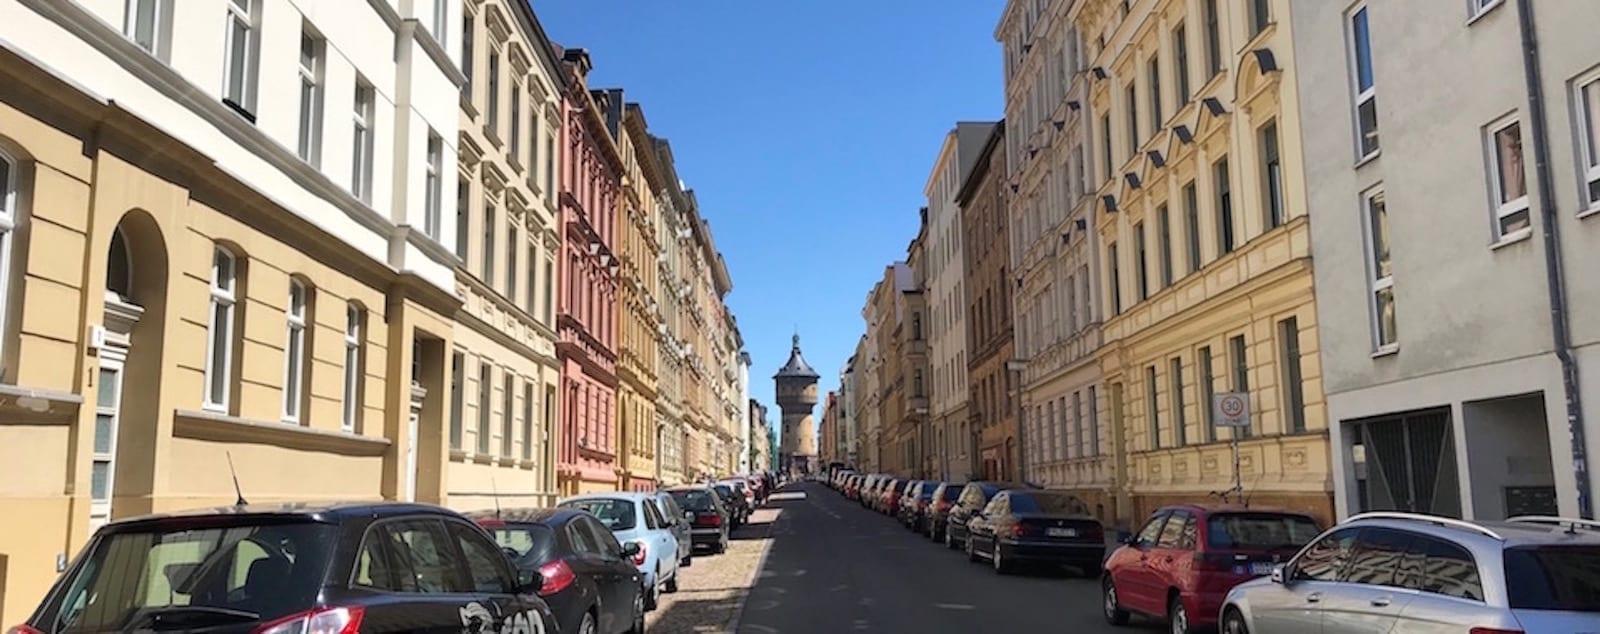 Lessingstraße in Halle